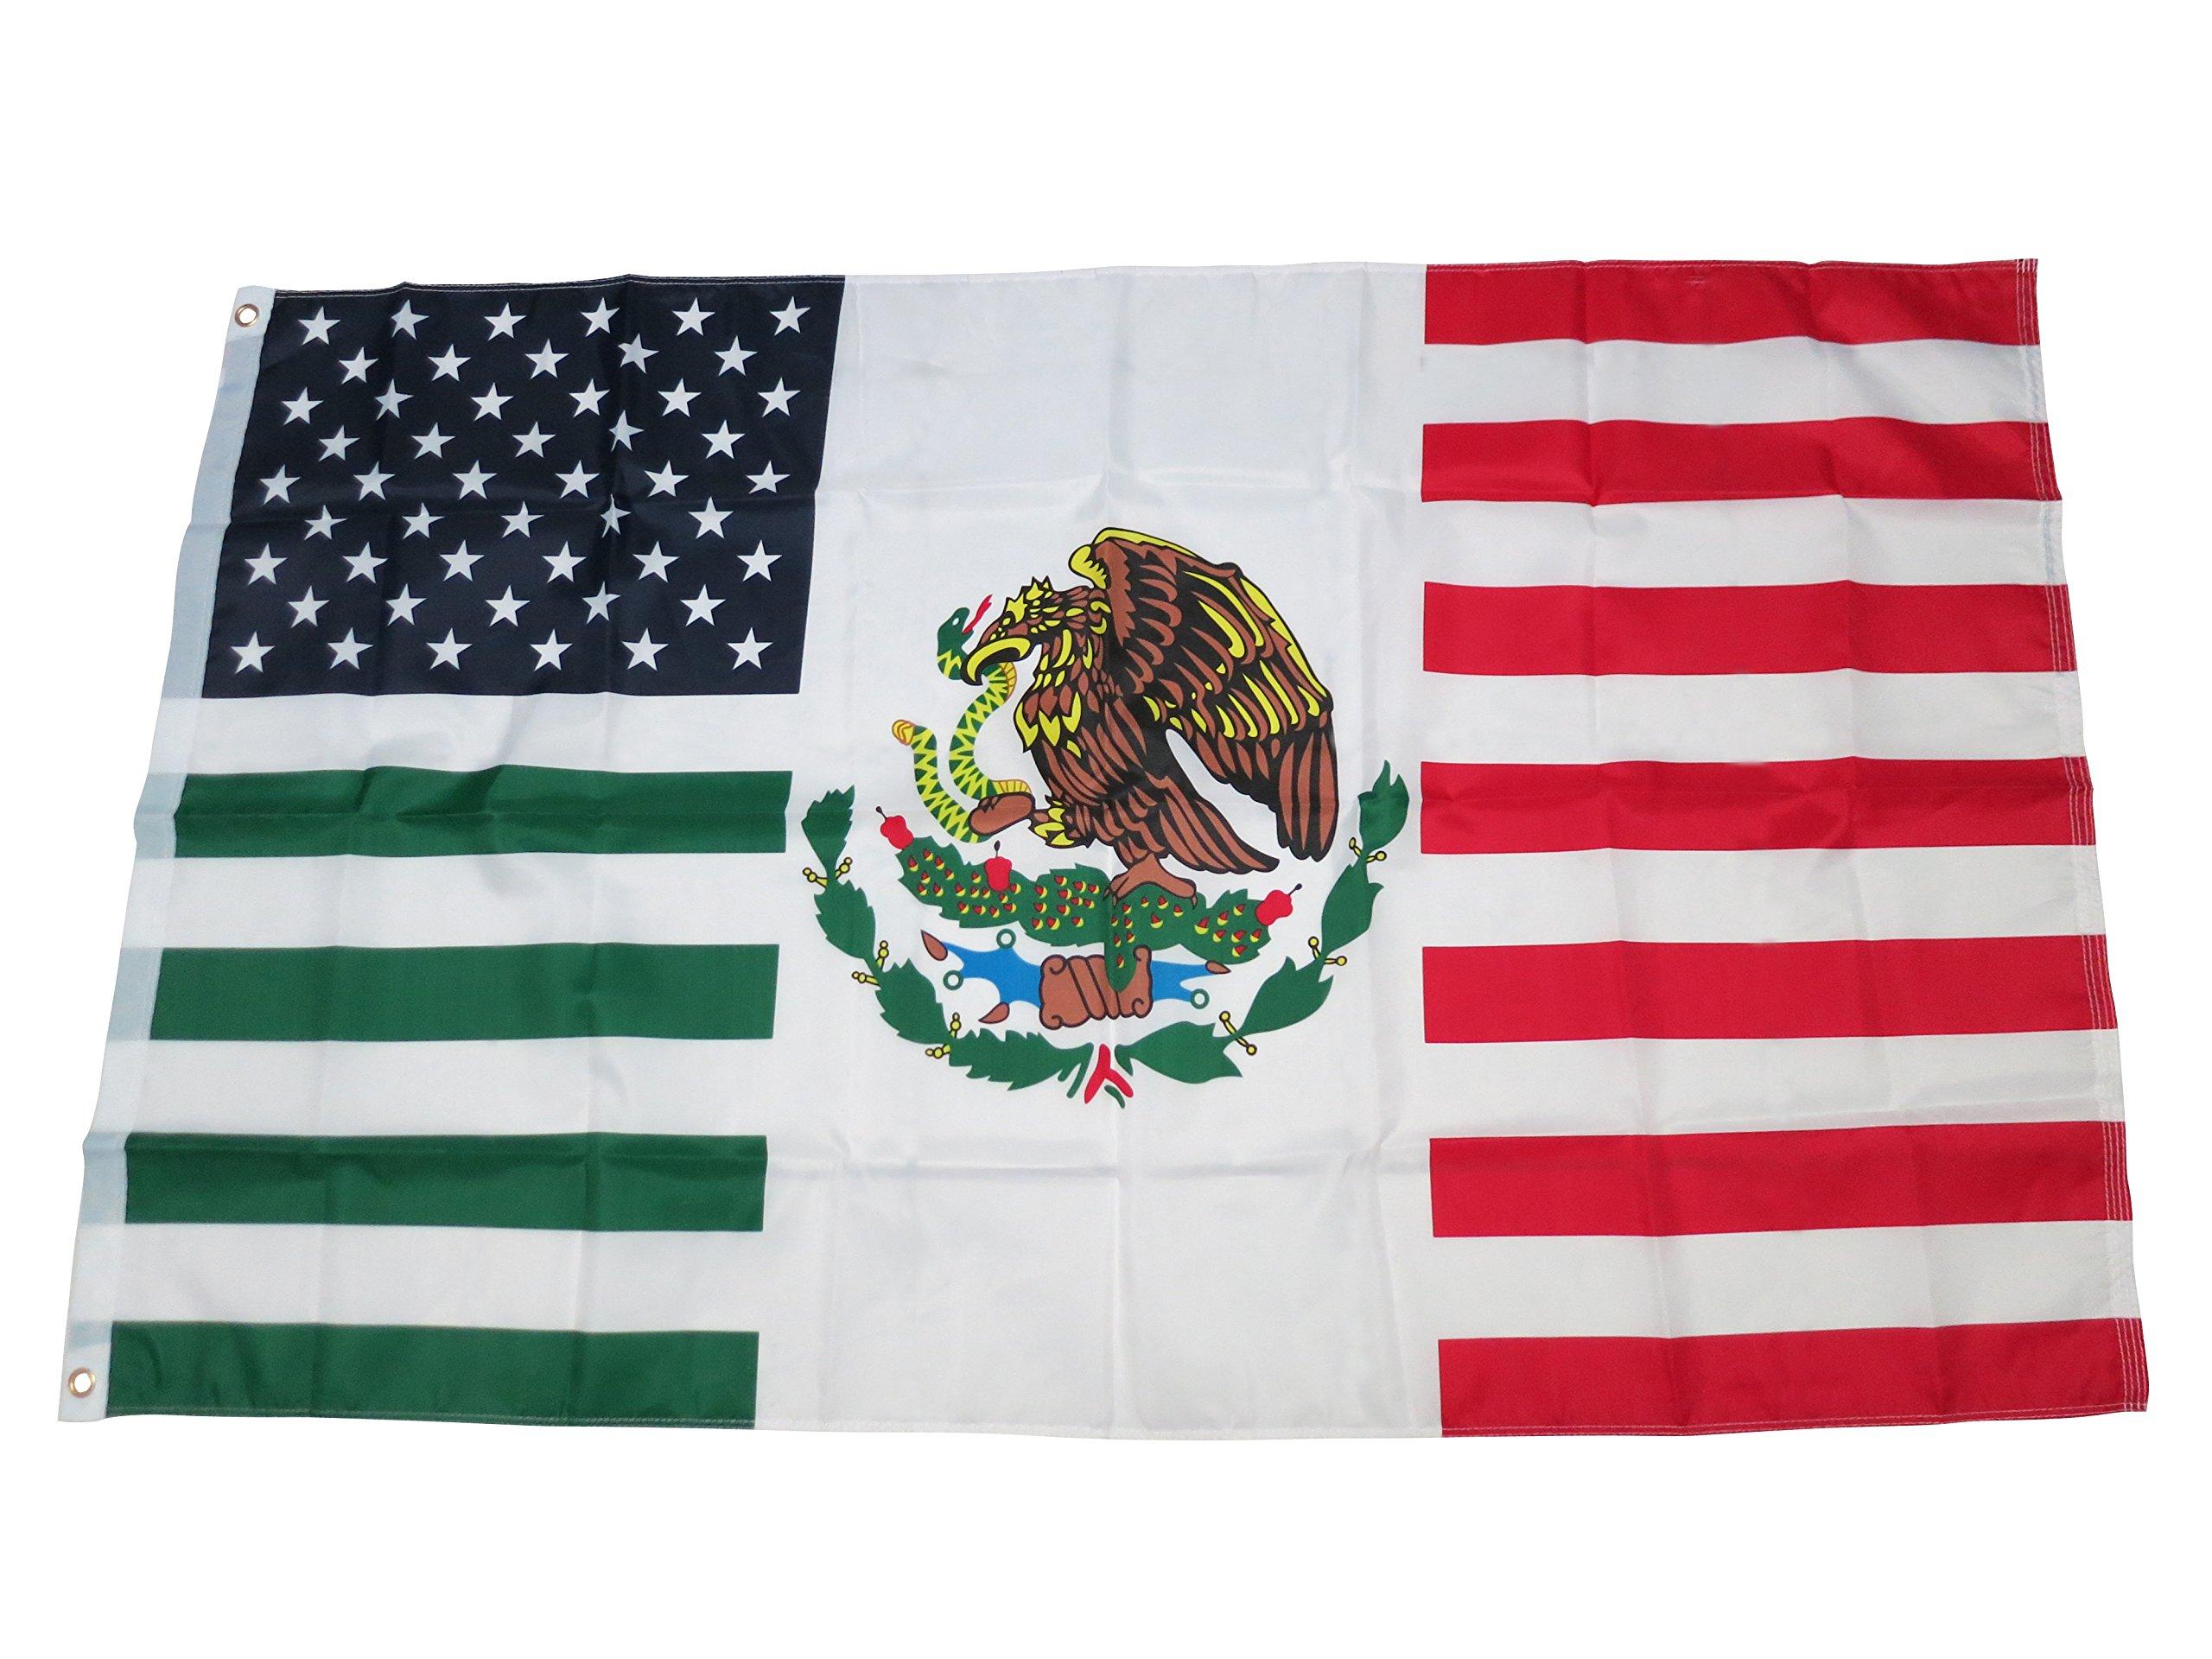 TrendyLuz Flags USA Mexico Friendship American Mexican Combination 3x5 Flag